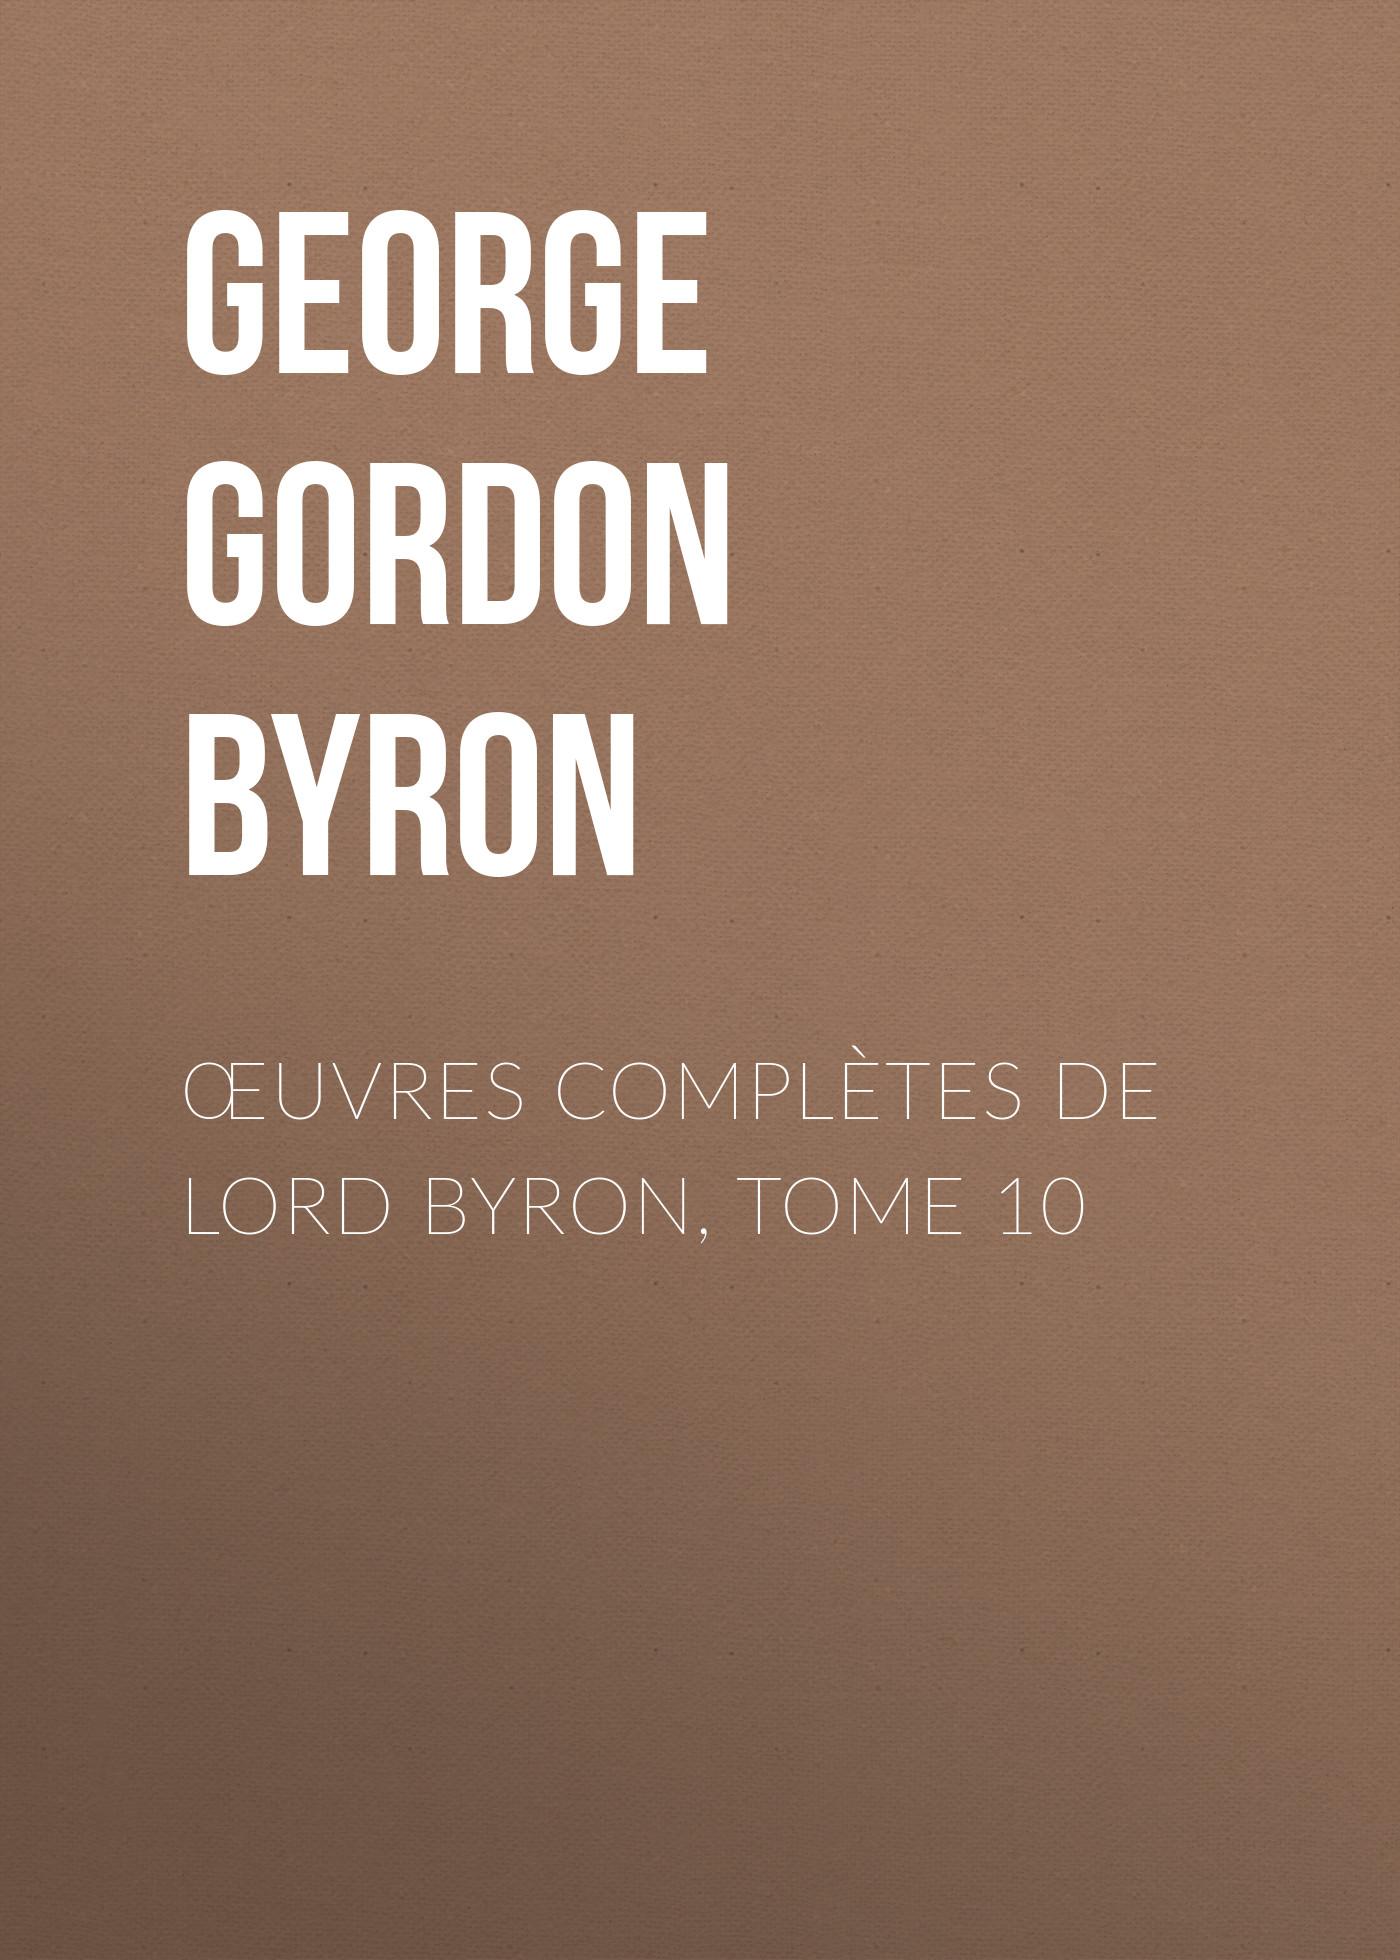 Джордж Гордон Байрон Œuvres complètes de lord Byron, Tome 10 thomas medwin conversations of lord byron